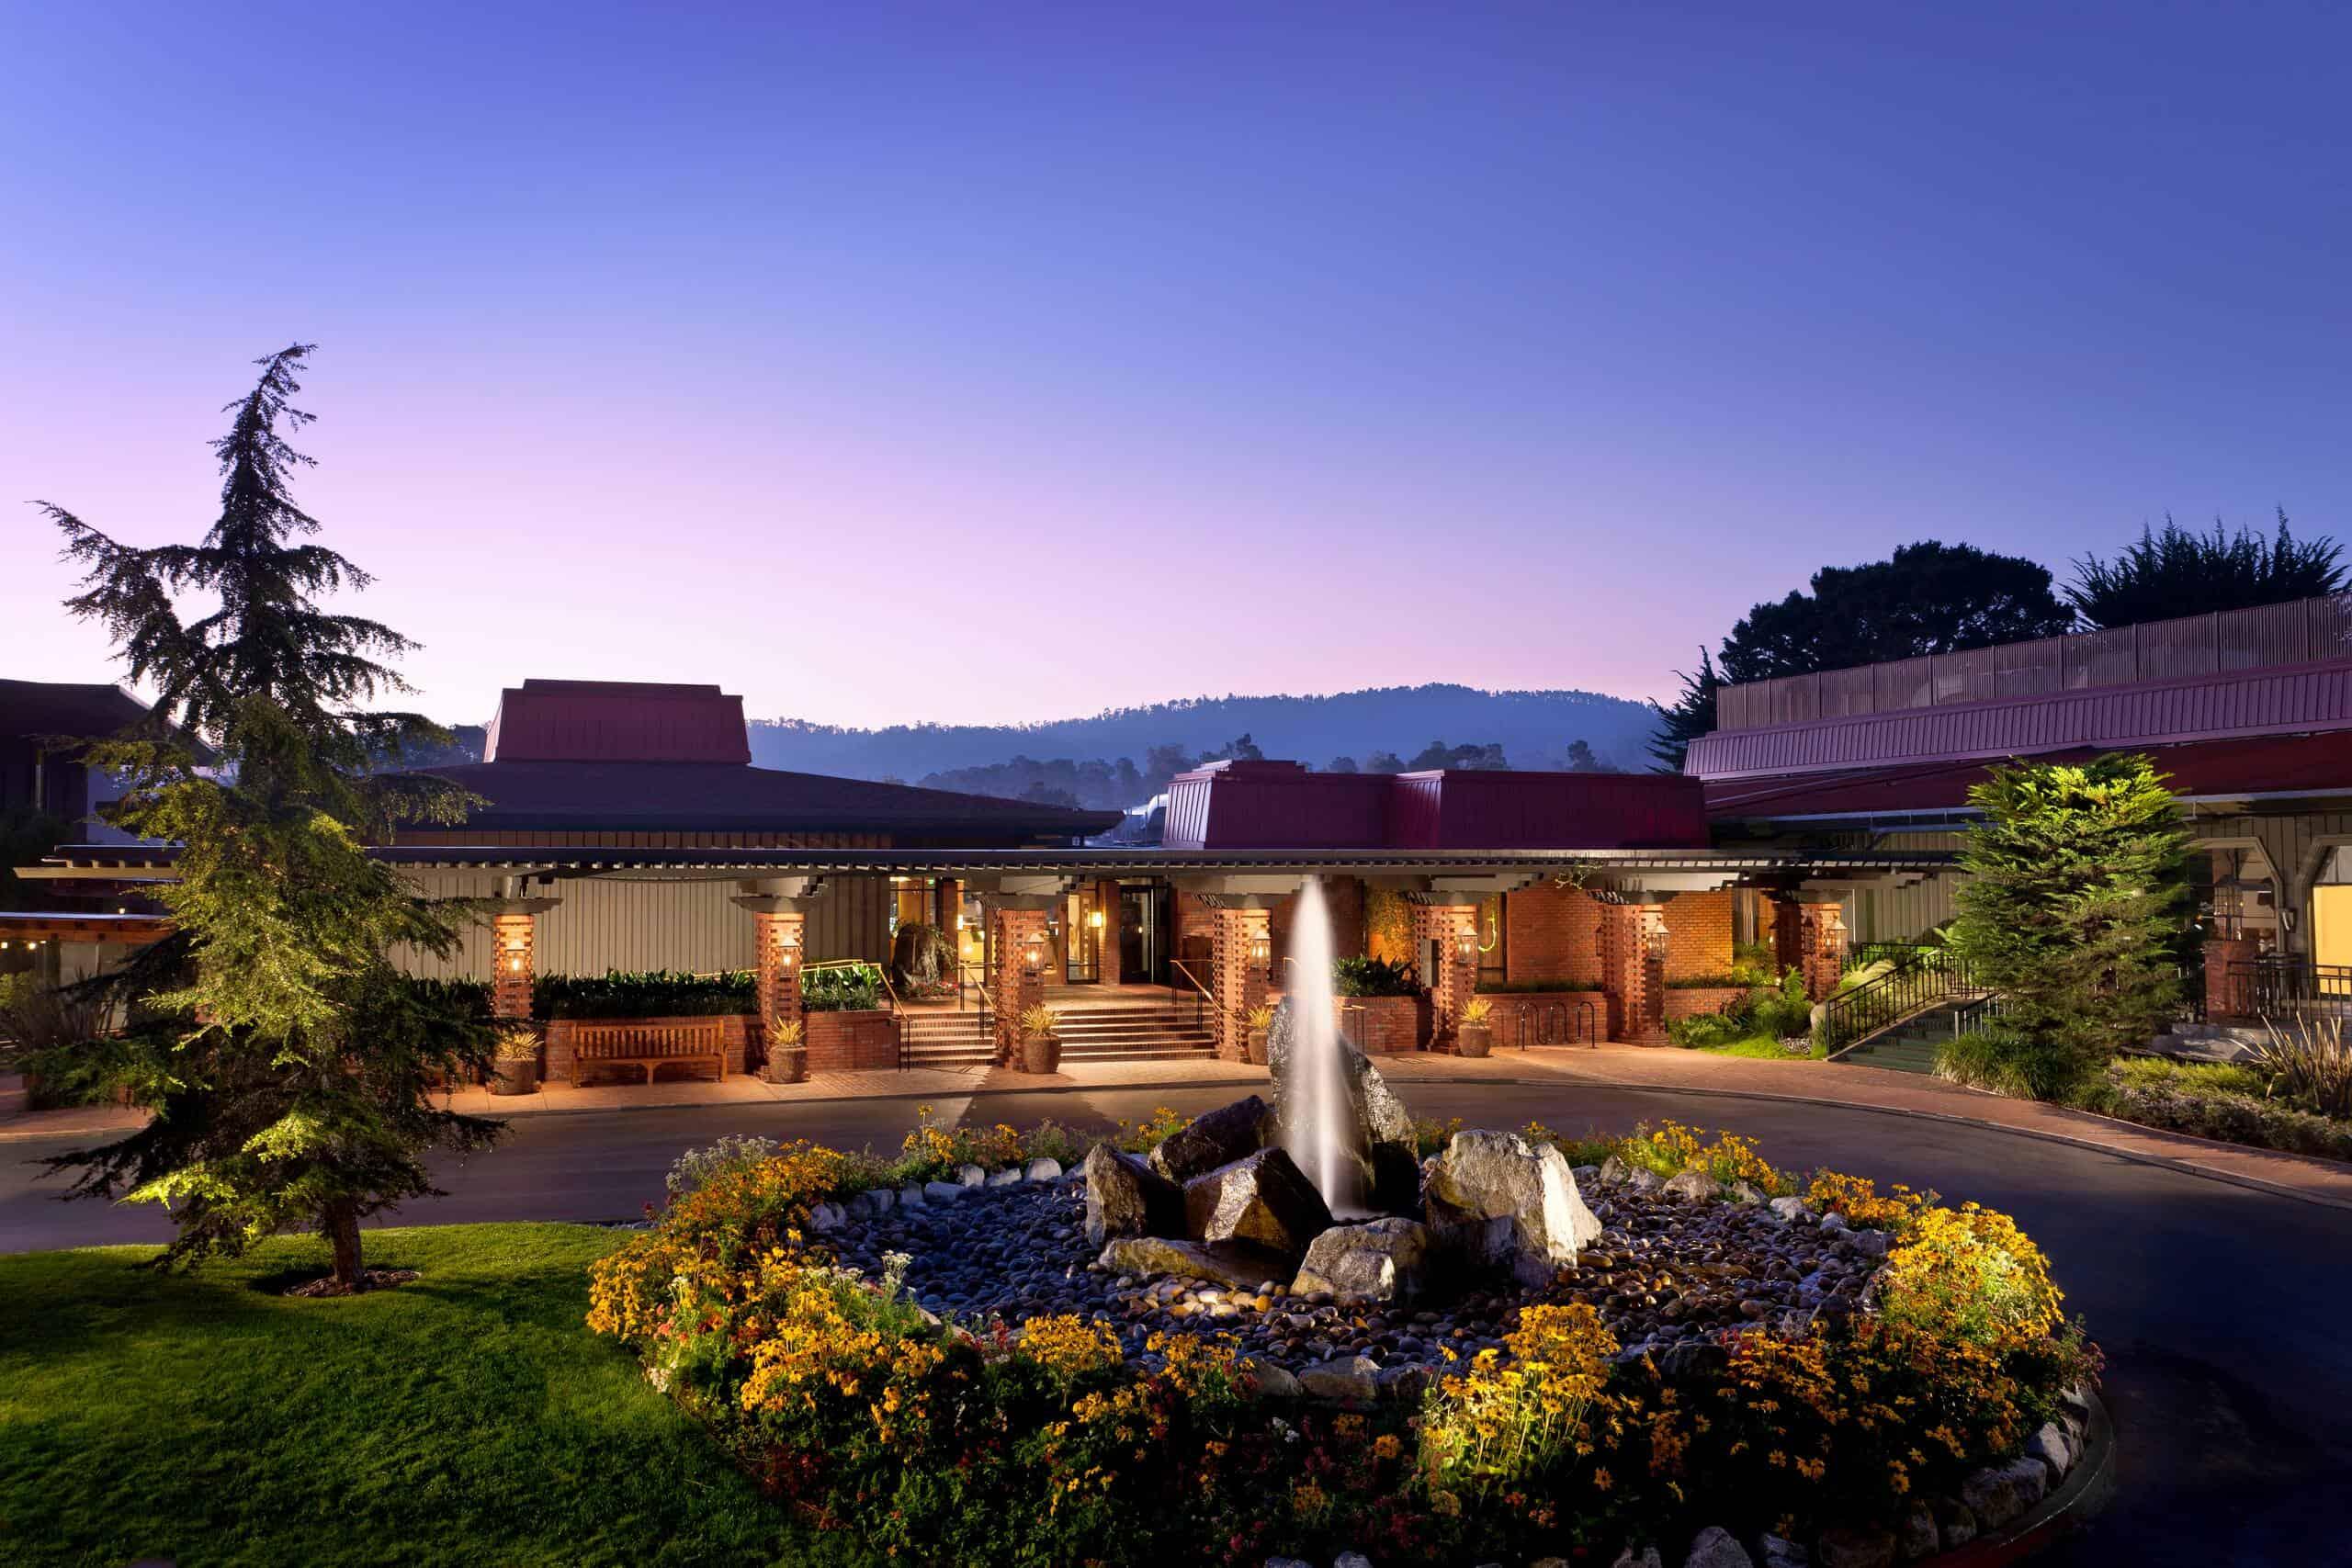 hyatt annual free nights - Hyatt Regency Monterey Hotel and Spa on Del Monte Golf Course